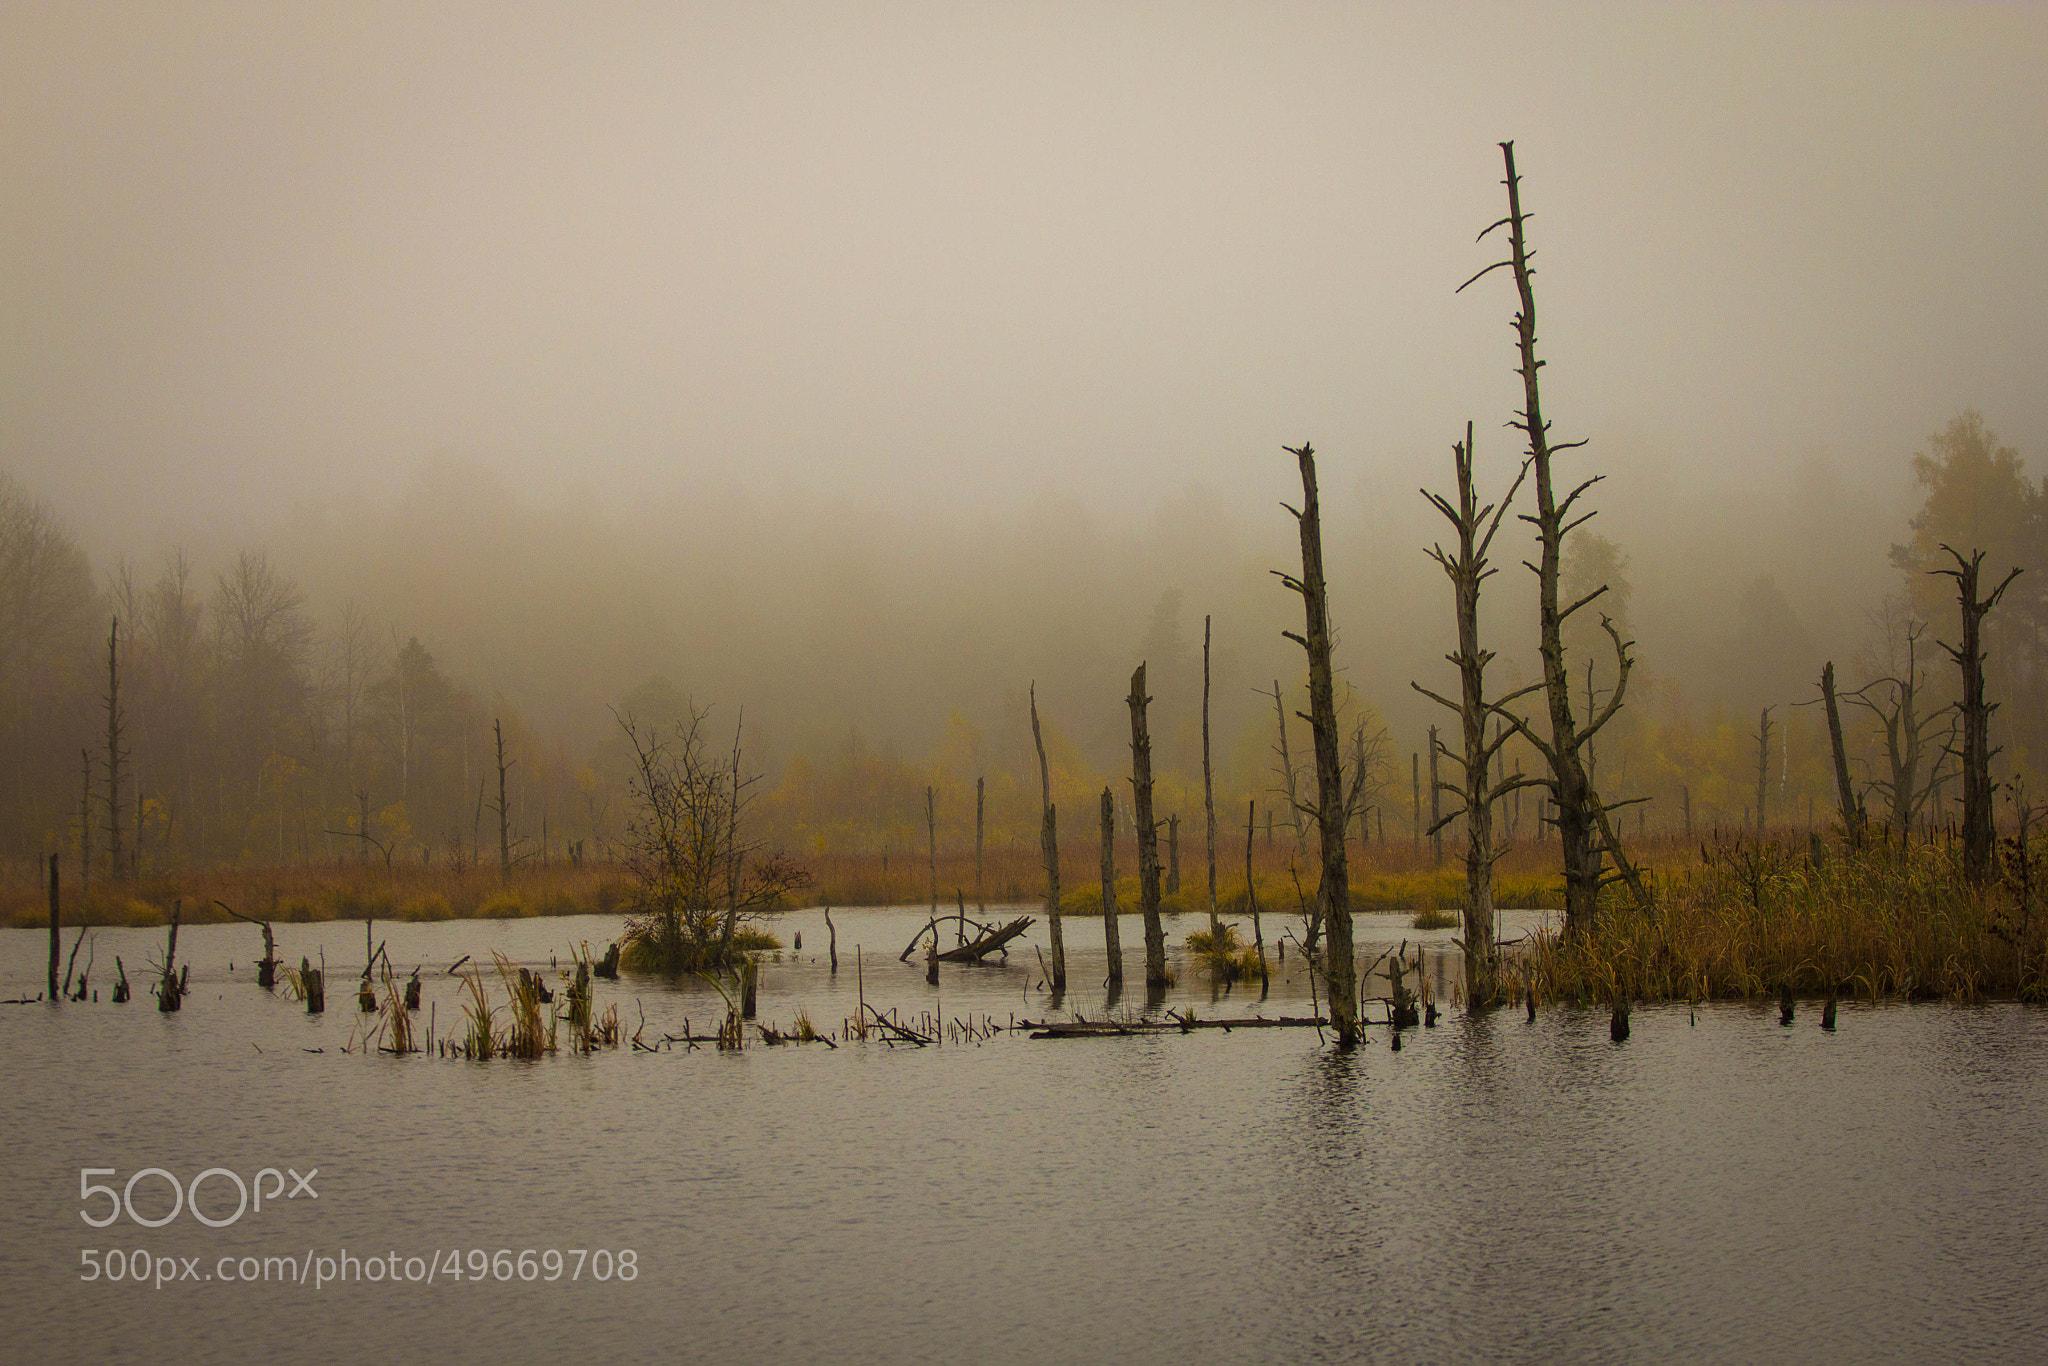 Photograph Autumn in moss in Schwenningen, Germany by Heike Kitzig on 500px